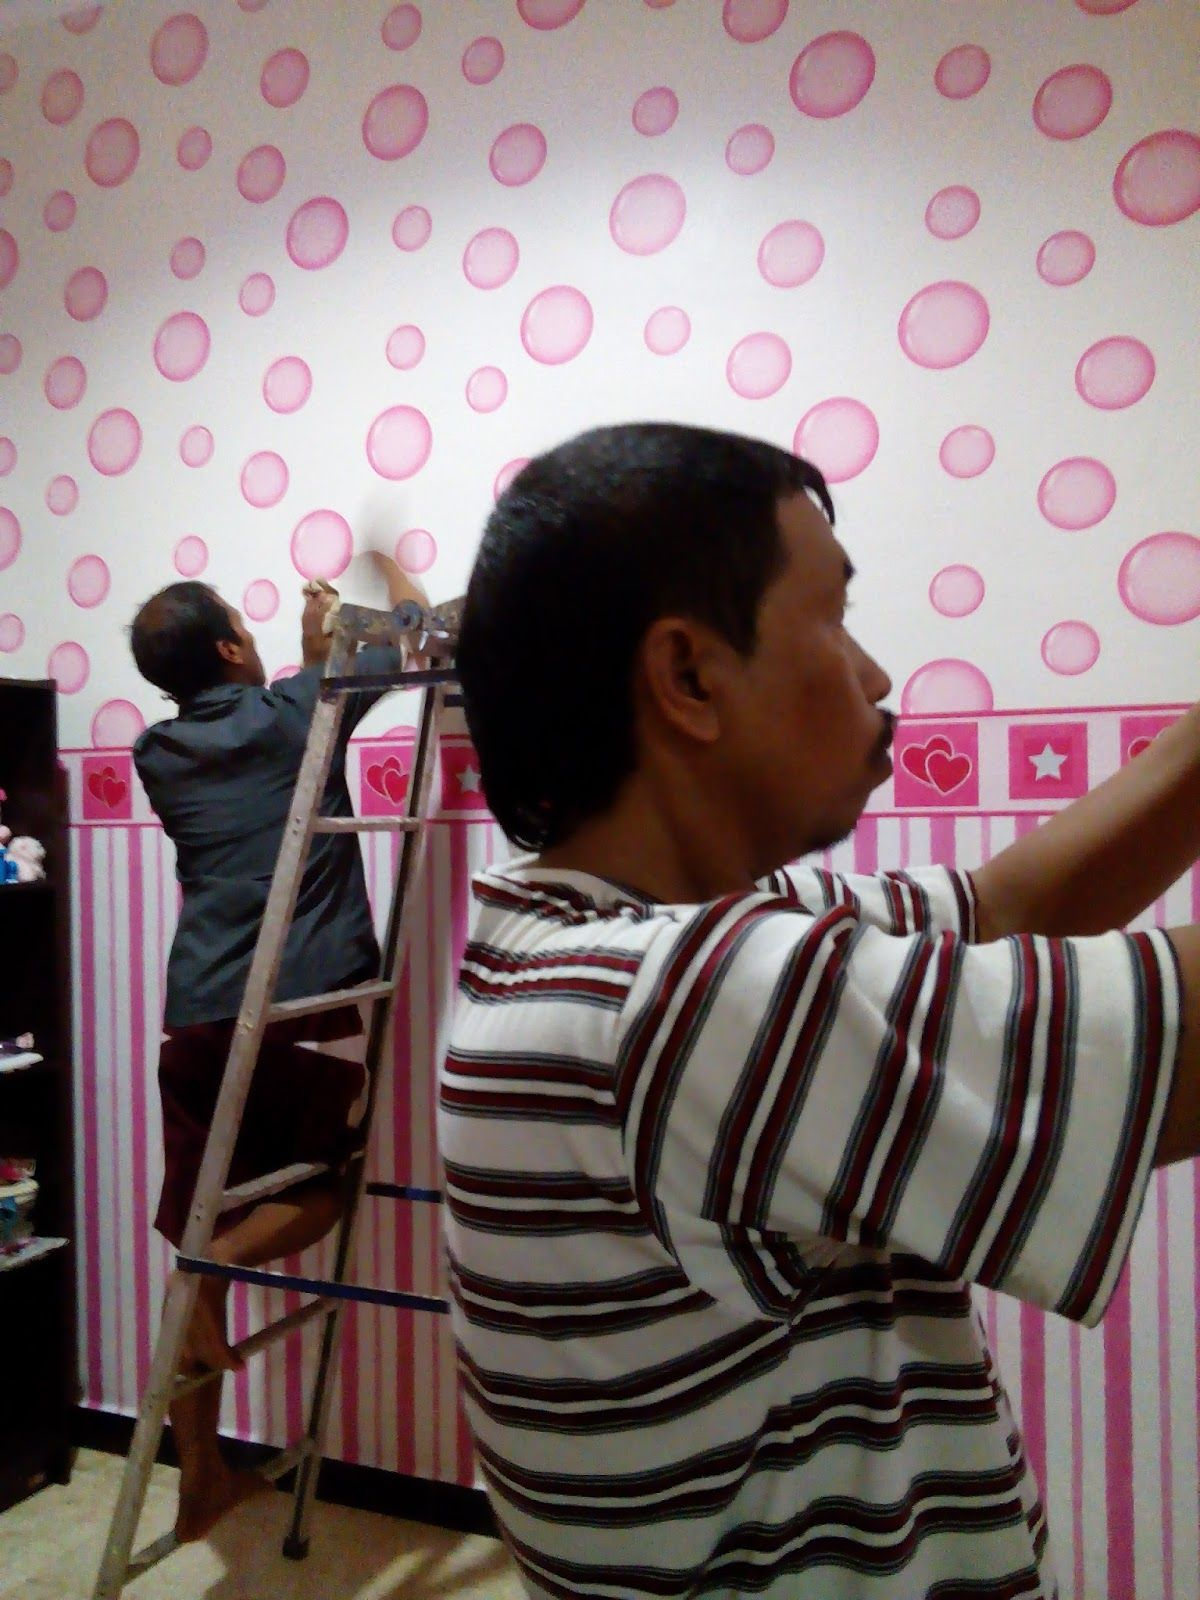 0821 32673033 Toko Grosir Wallpaper Dinding Murah Malang Kediri